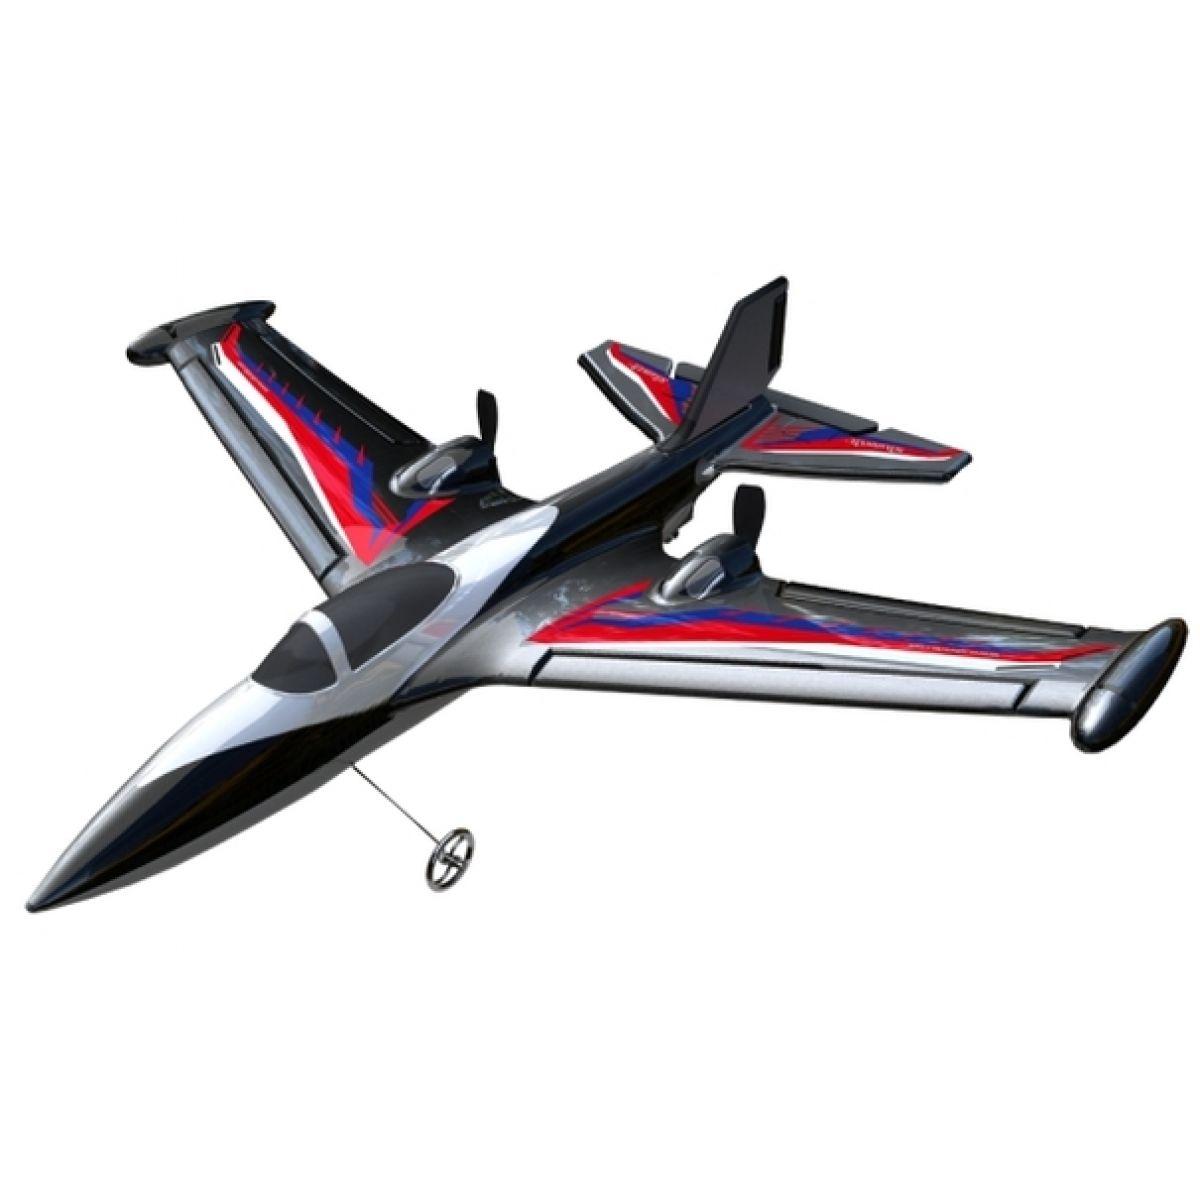 Letadlo X-Twin R/C Air Acrobat - Červená